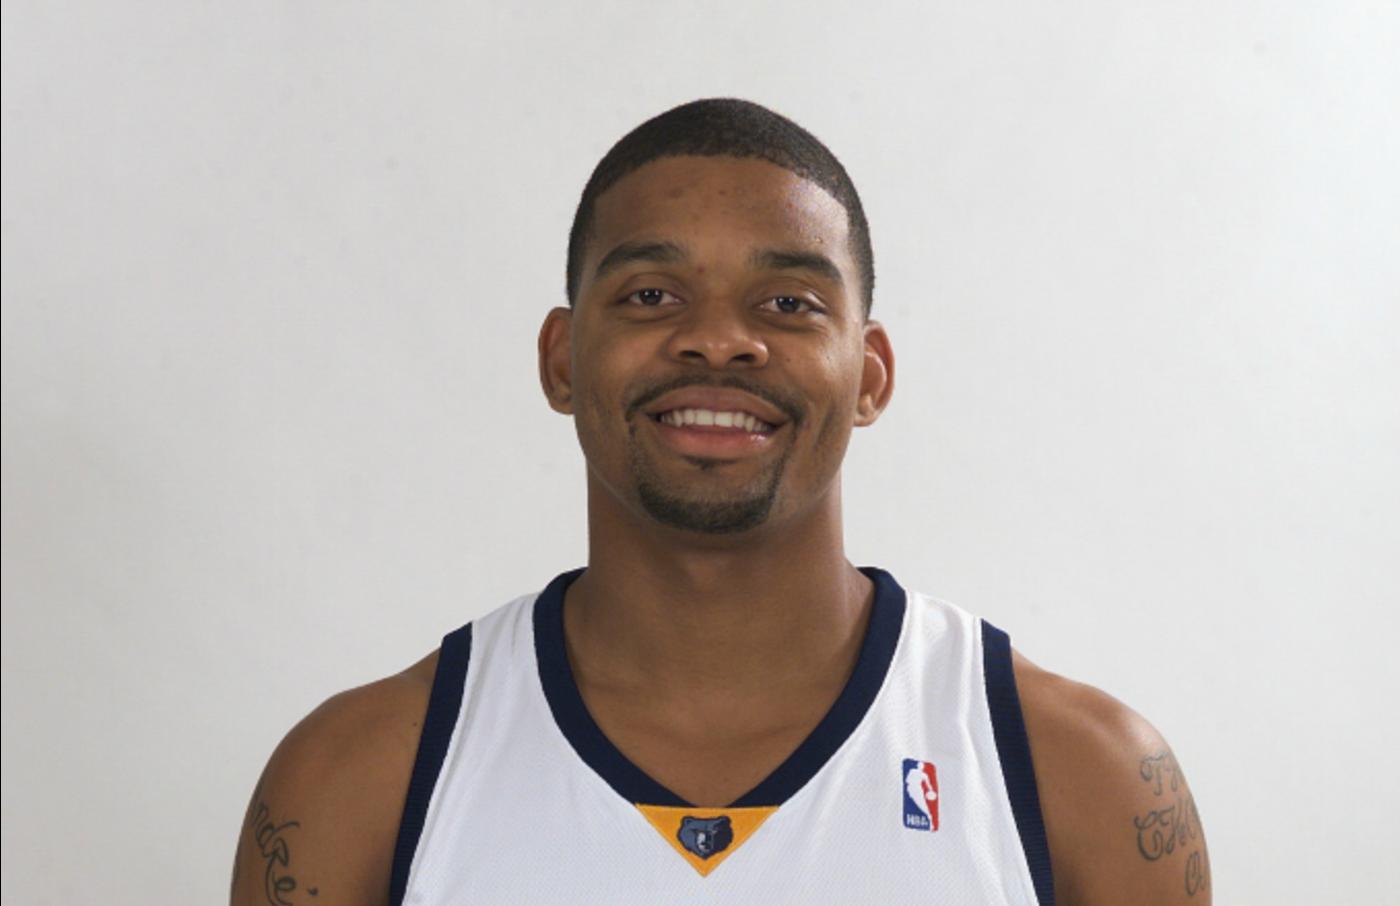 Andre Emmett, a 2004 draft picks of the Memphis Grizzlies